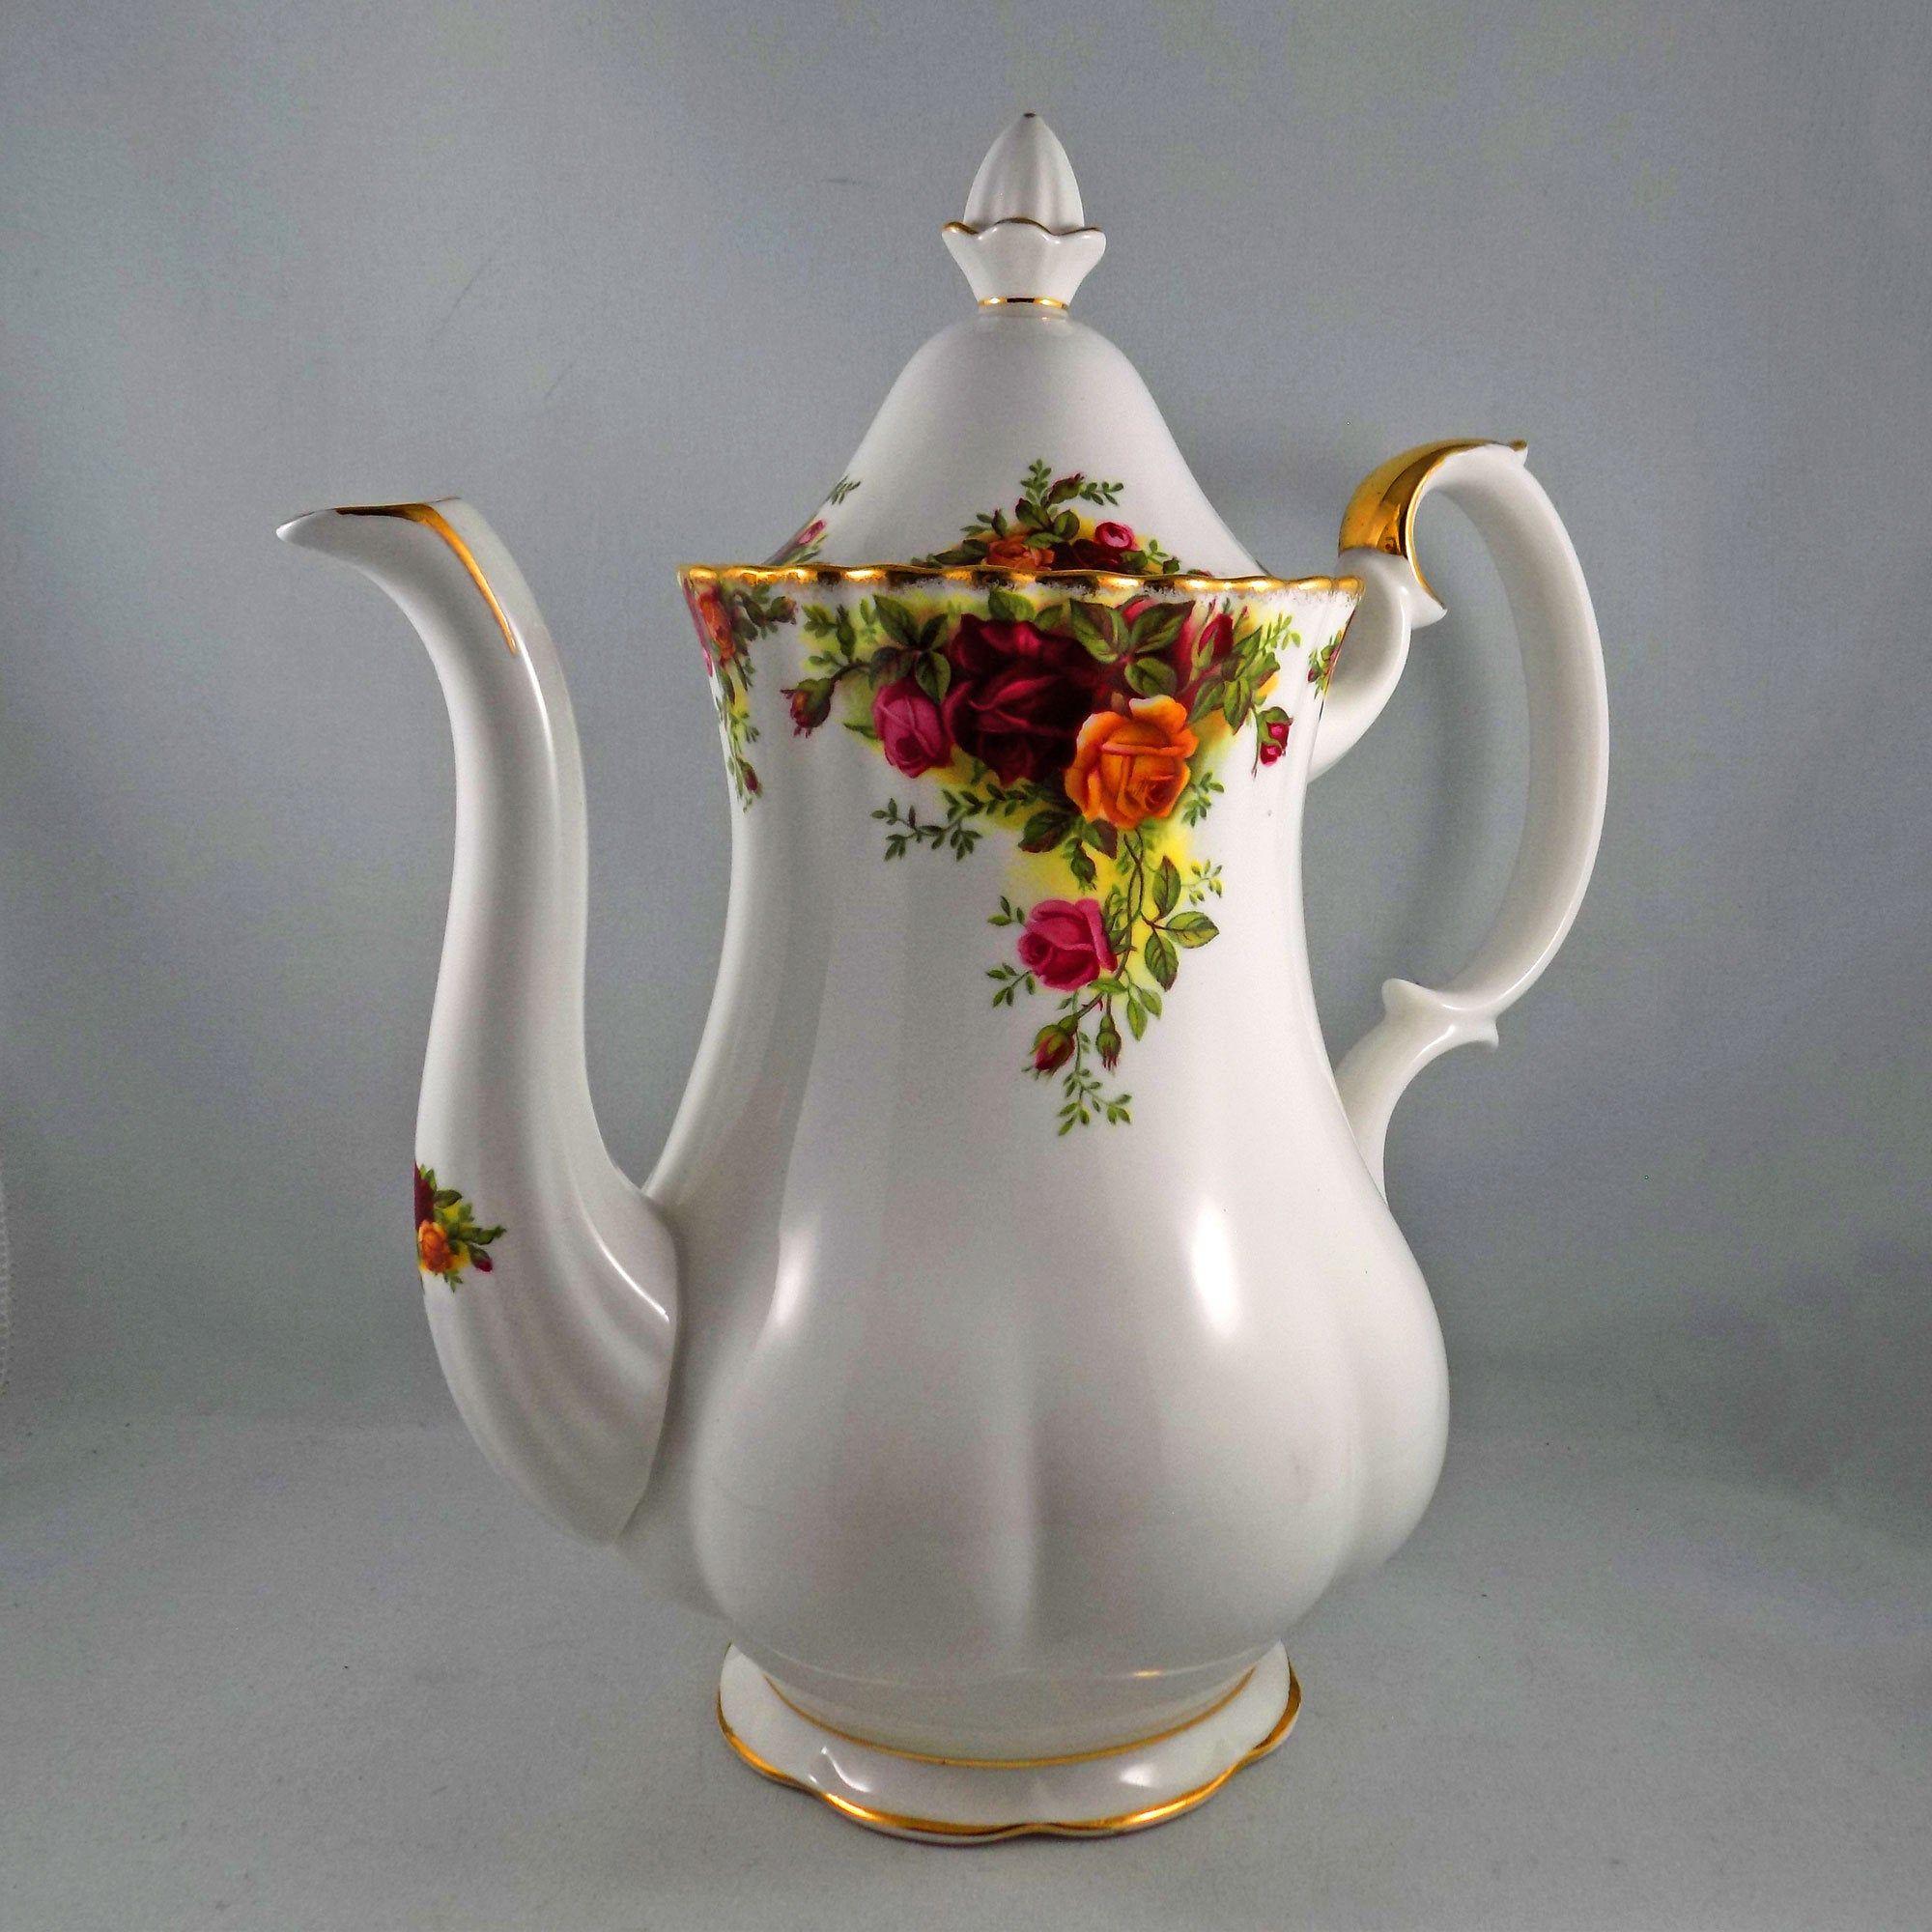 Royal Albert Vintage China Coffee Pot